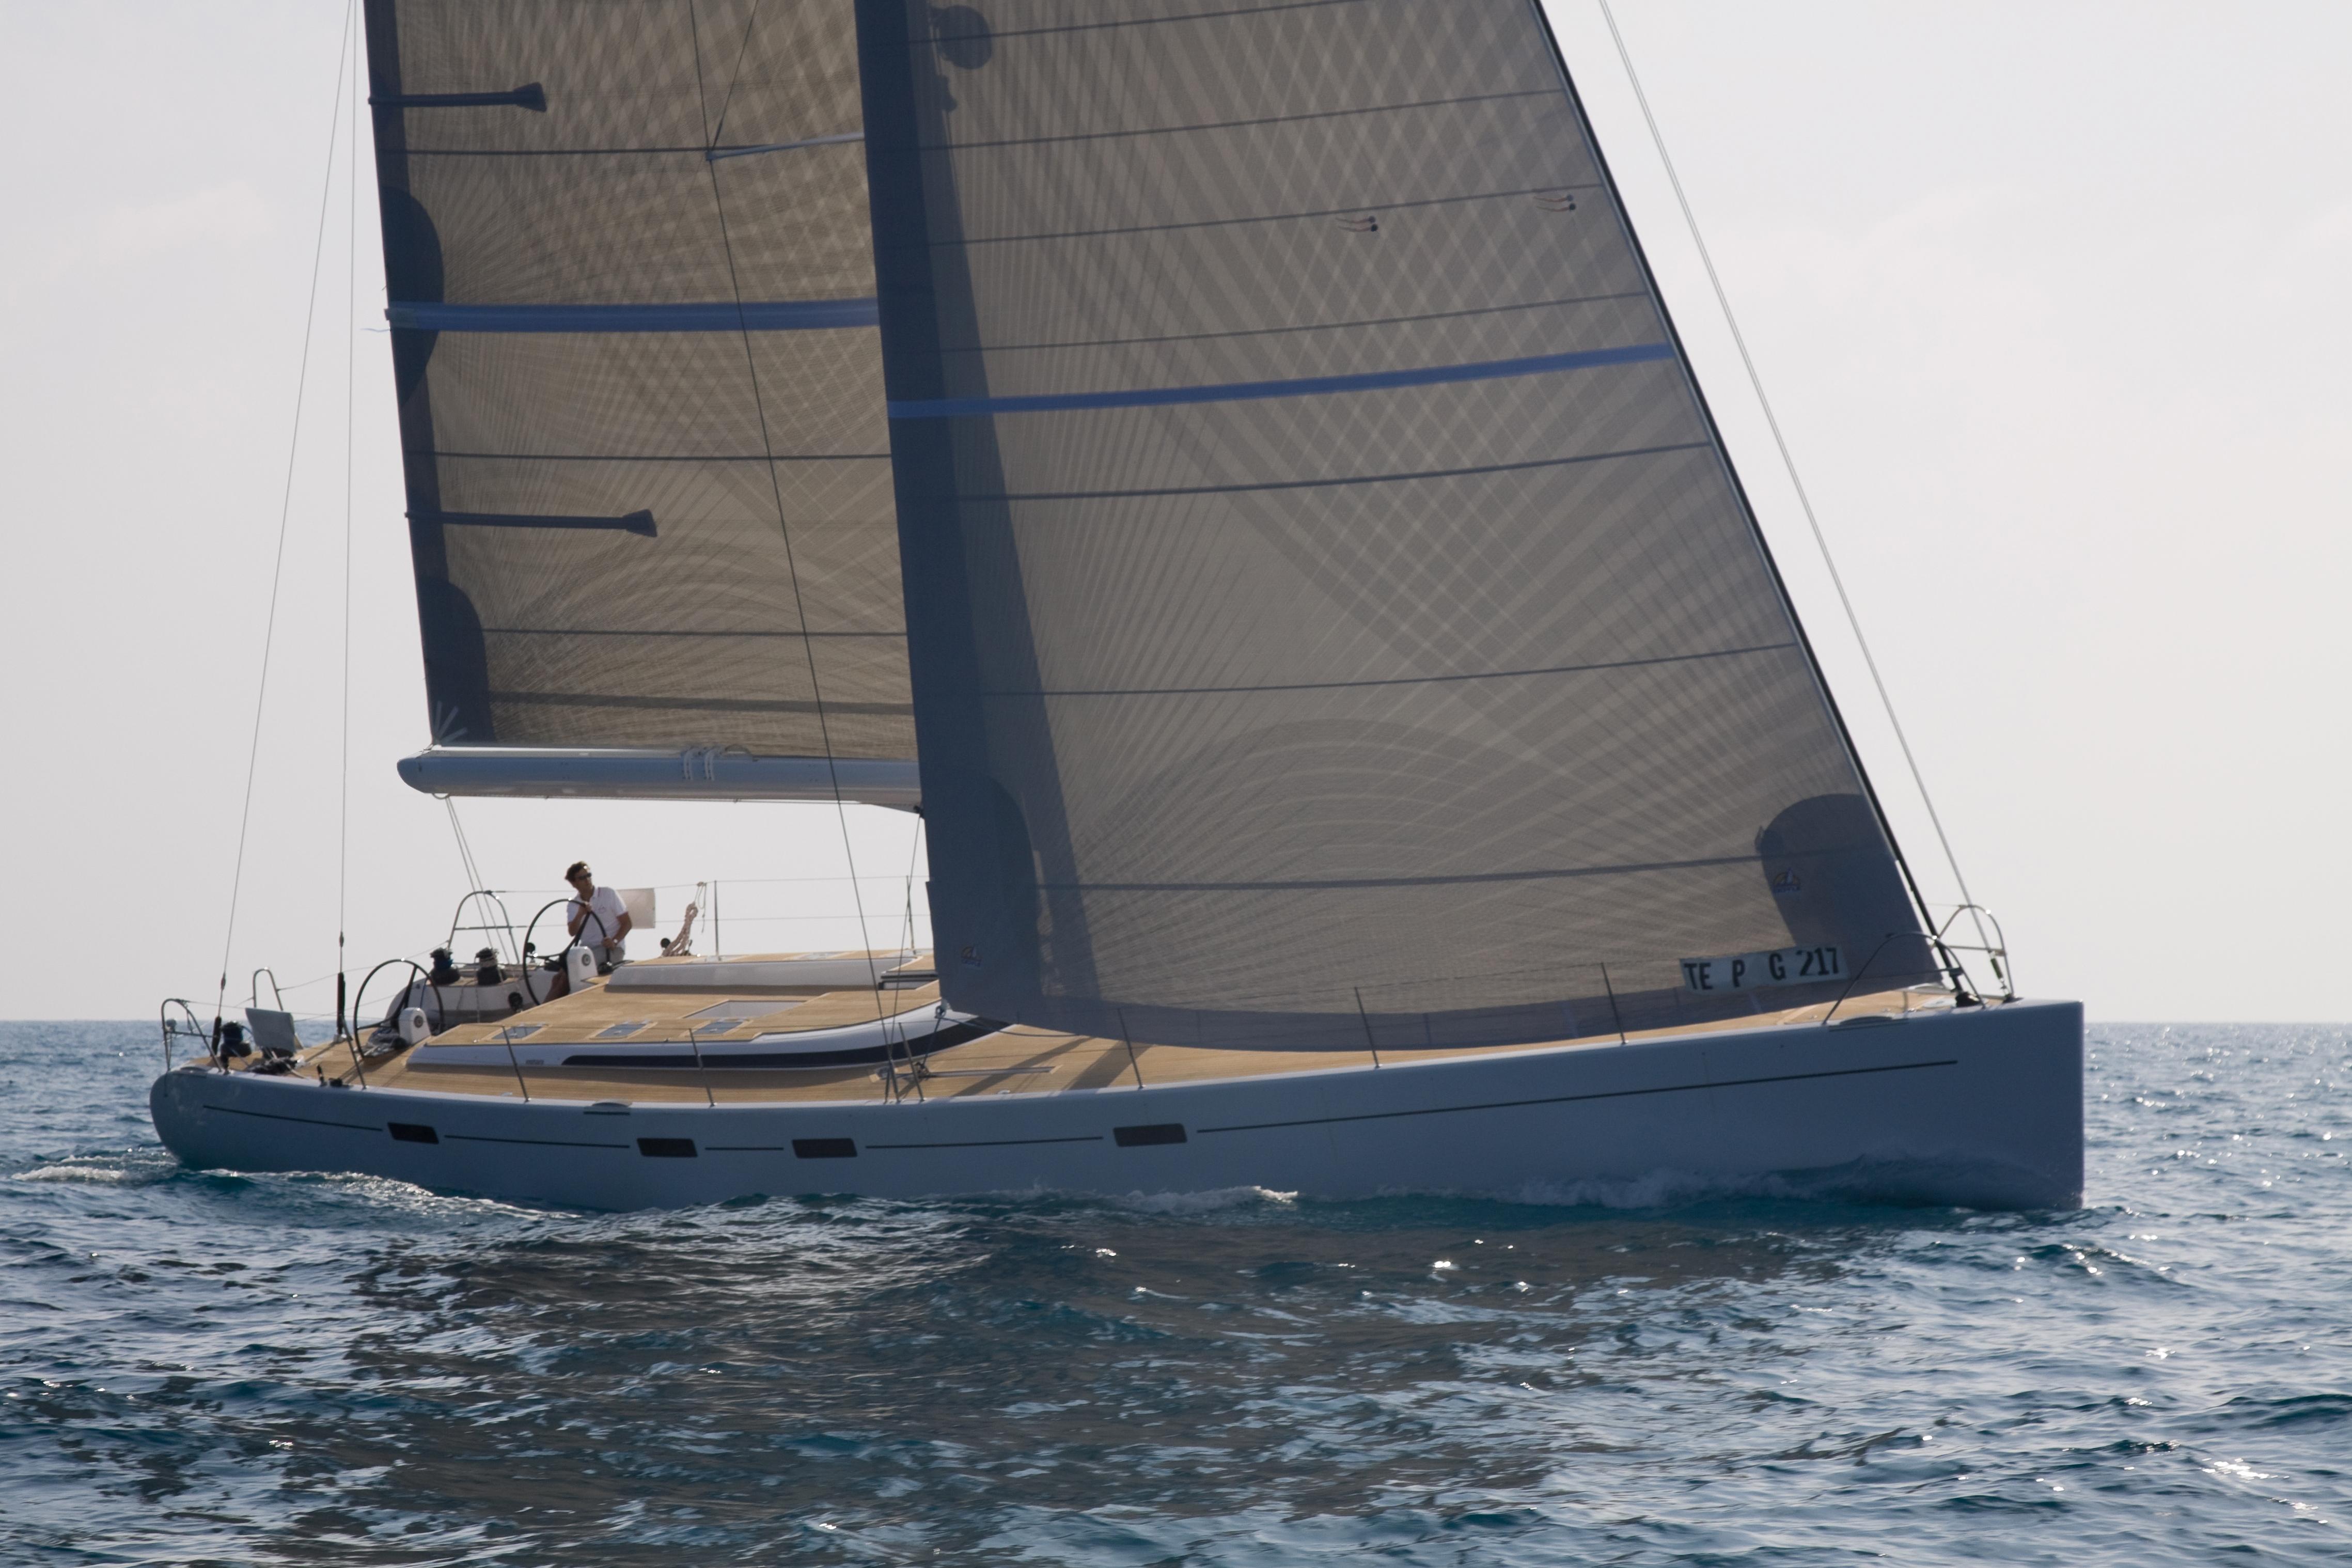 Fiberlay XC doyle Sails italia